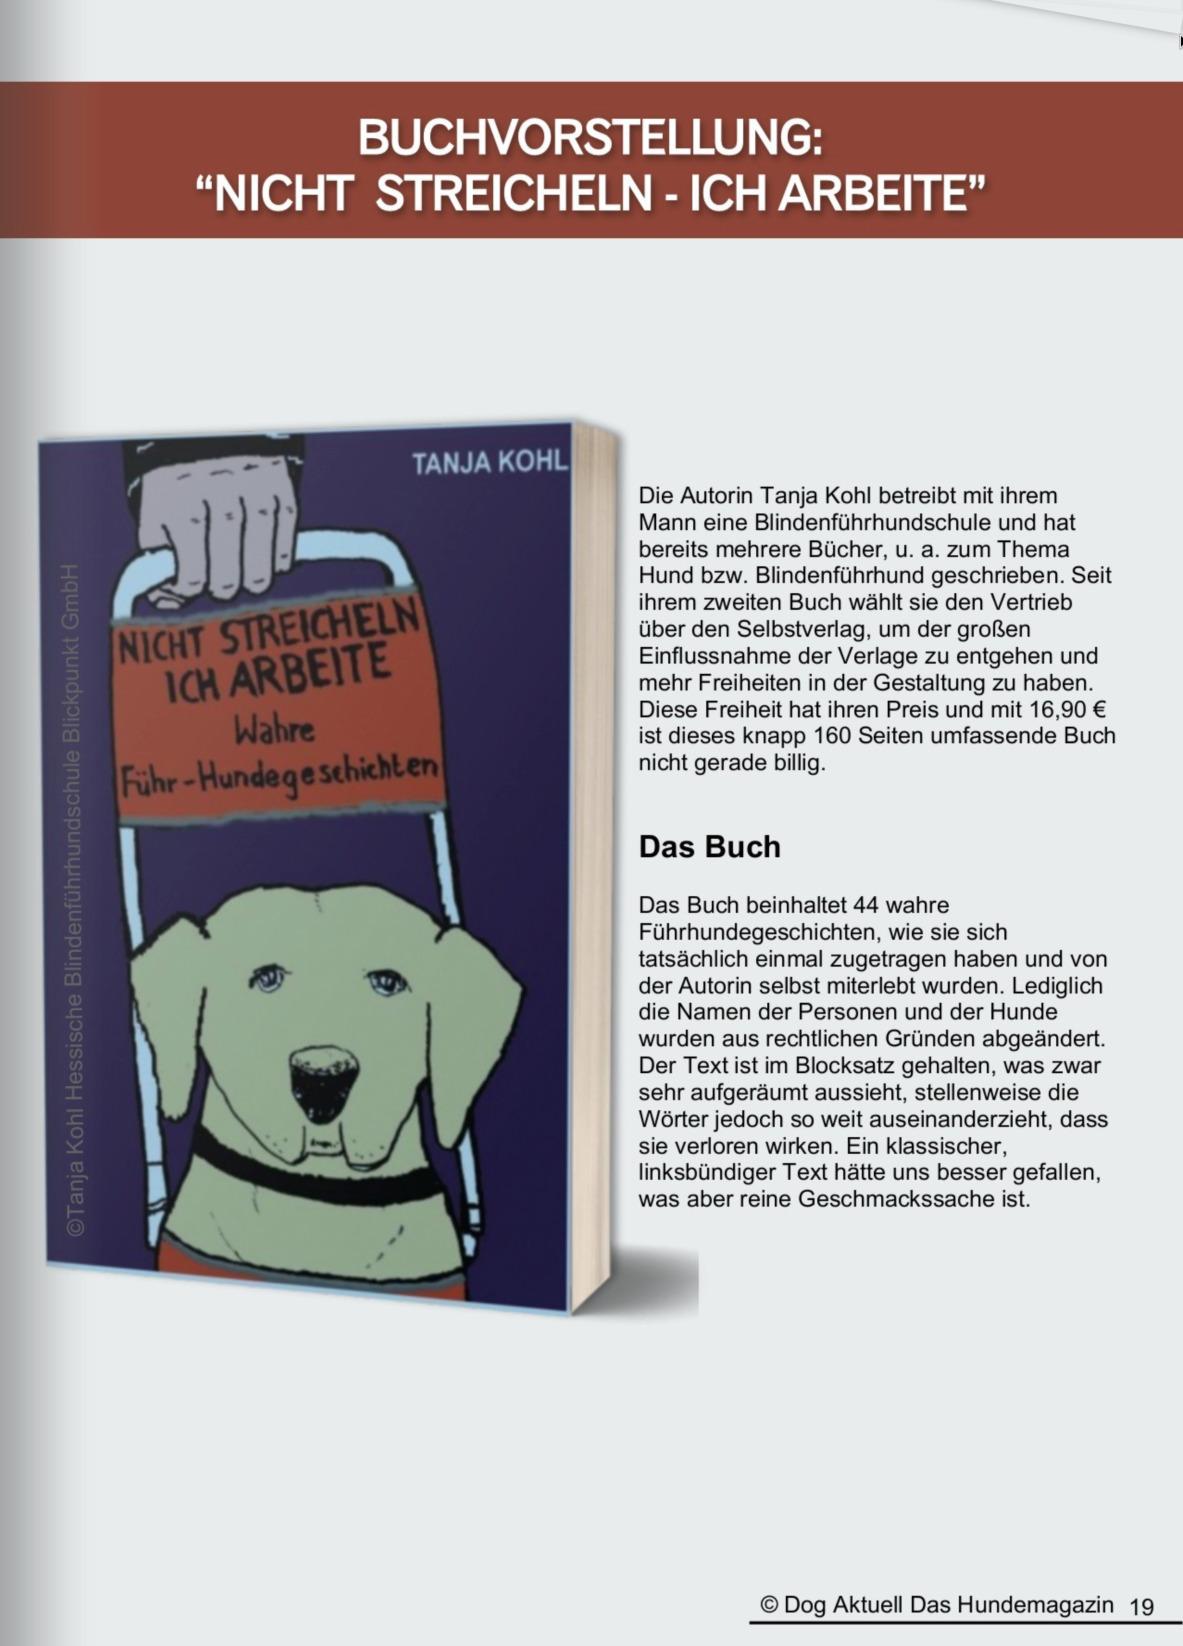 Dog Aktuell – Das Hundemagazin